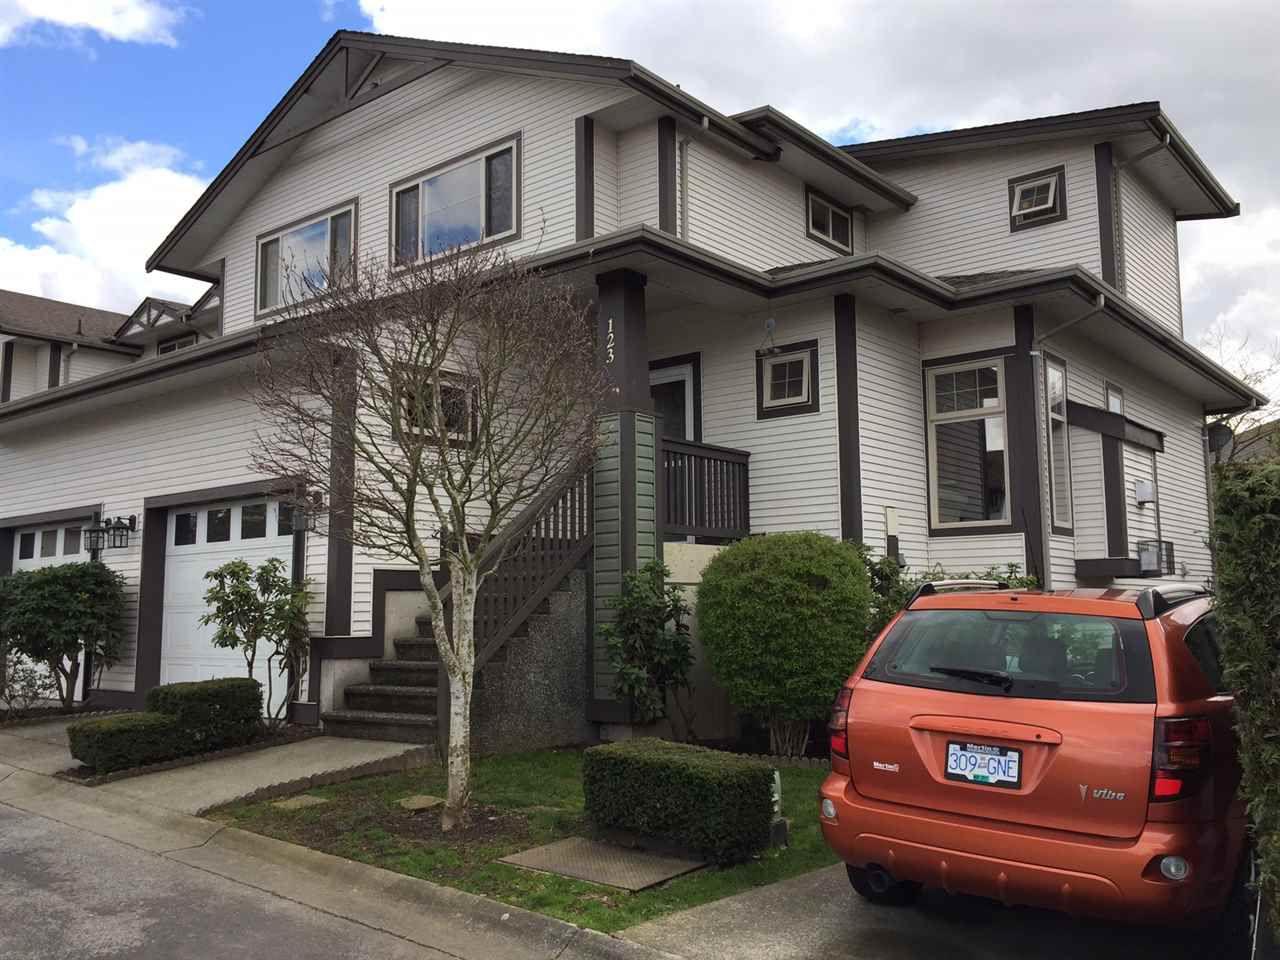 Main Photo: 123 20820 87 AVENUE in : Walnut Grove Condo for sale (Langley)  : MLS®# R2153485